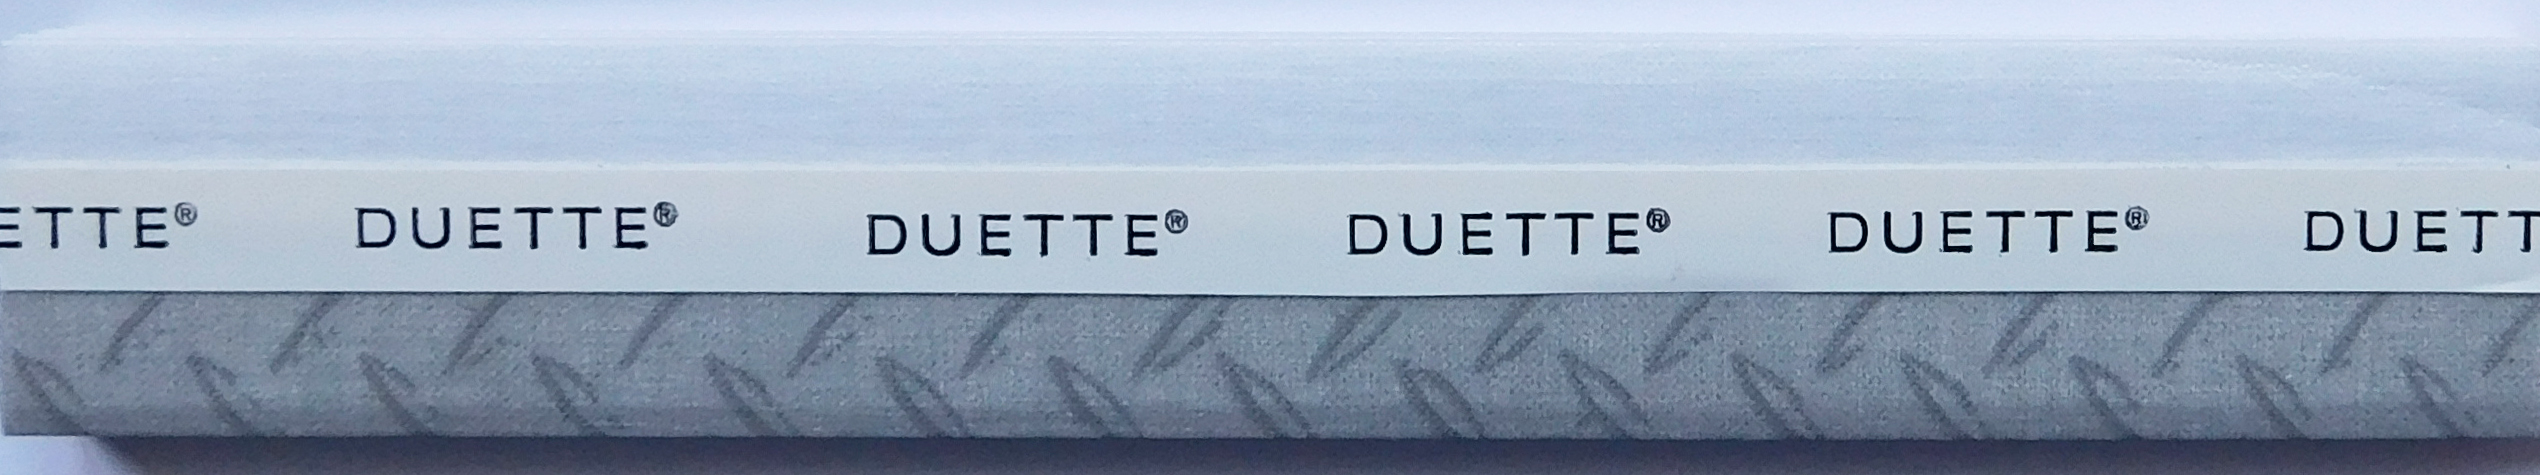 Hank Agate Grey Duette Blind fabric